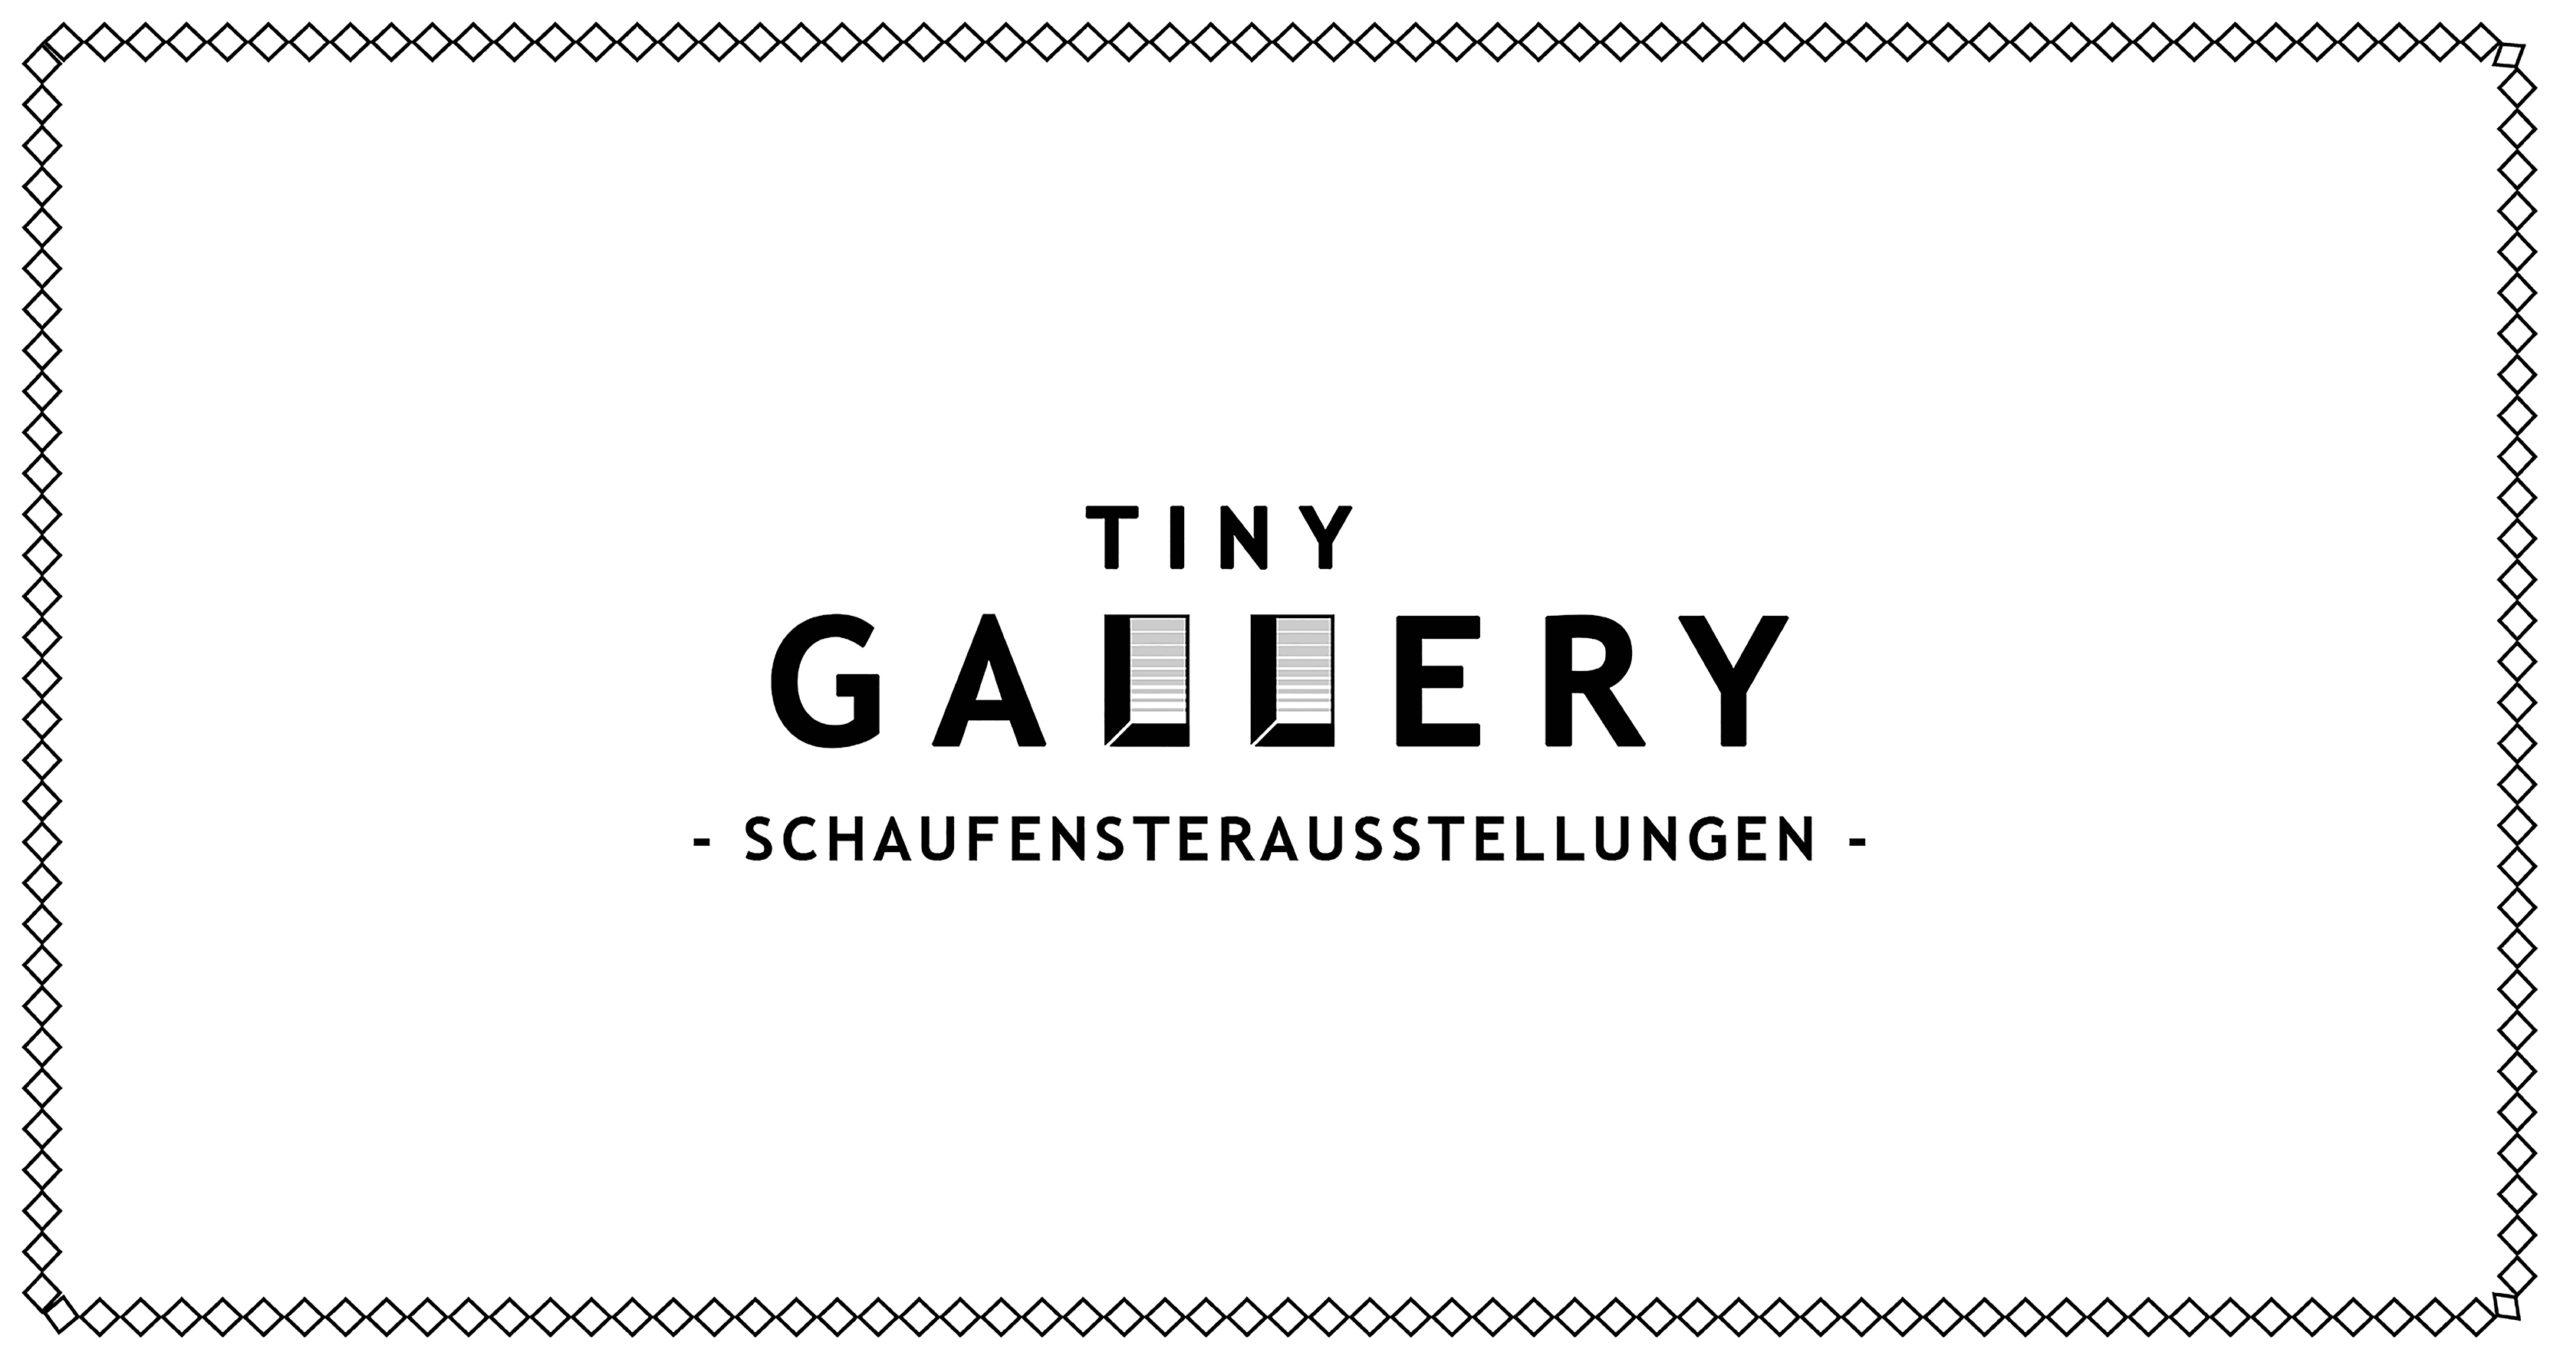 KNH-Tiny Gallery #6 I 10. Juni bis 1. Juli